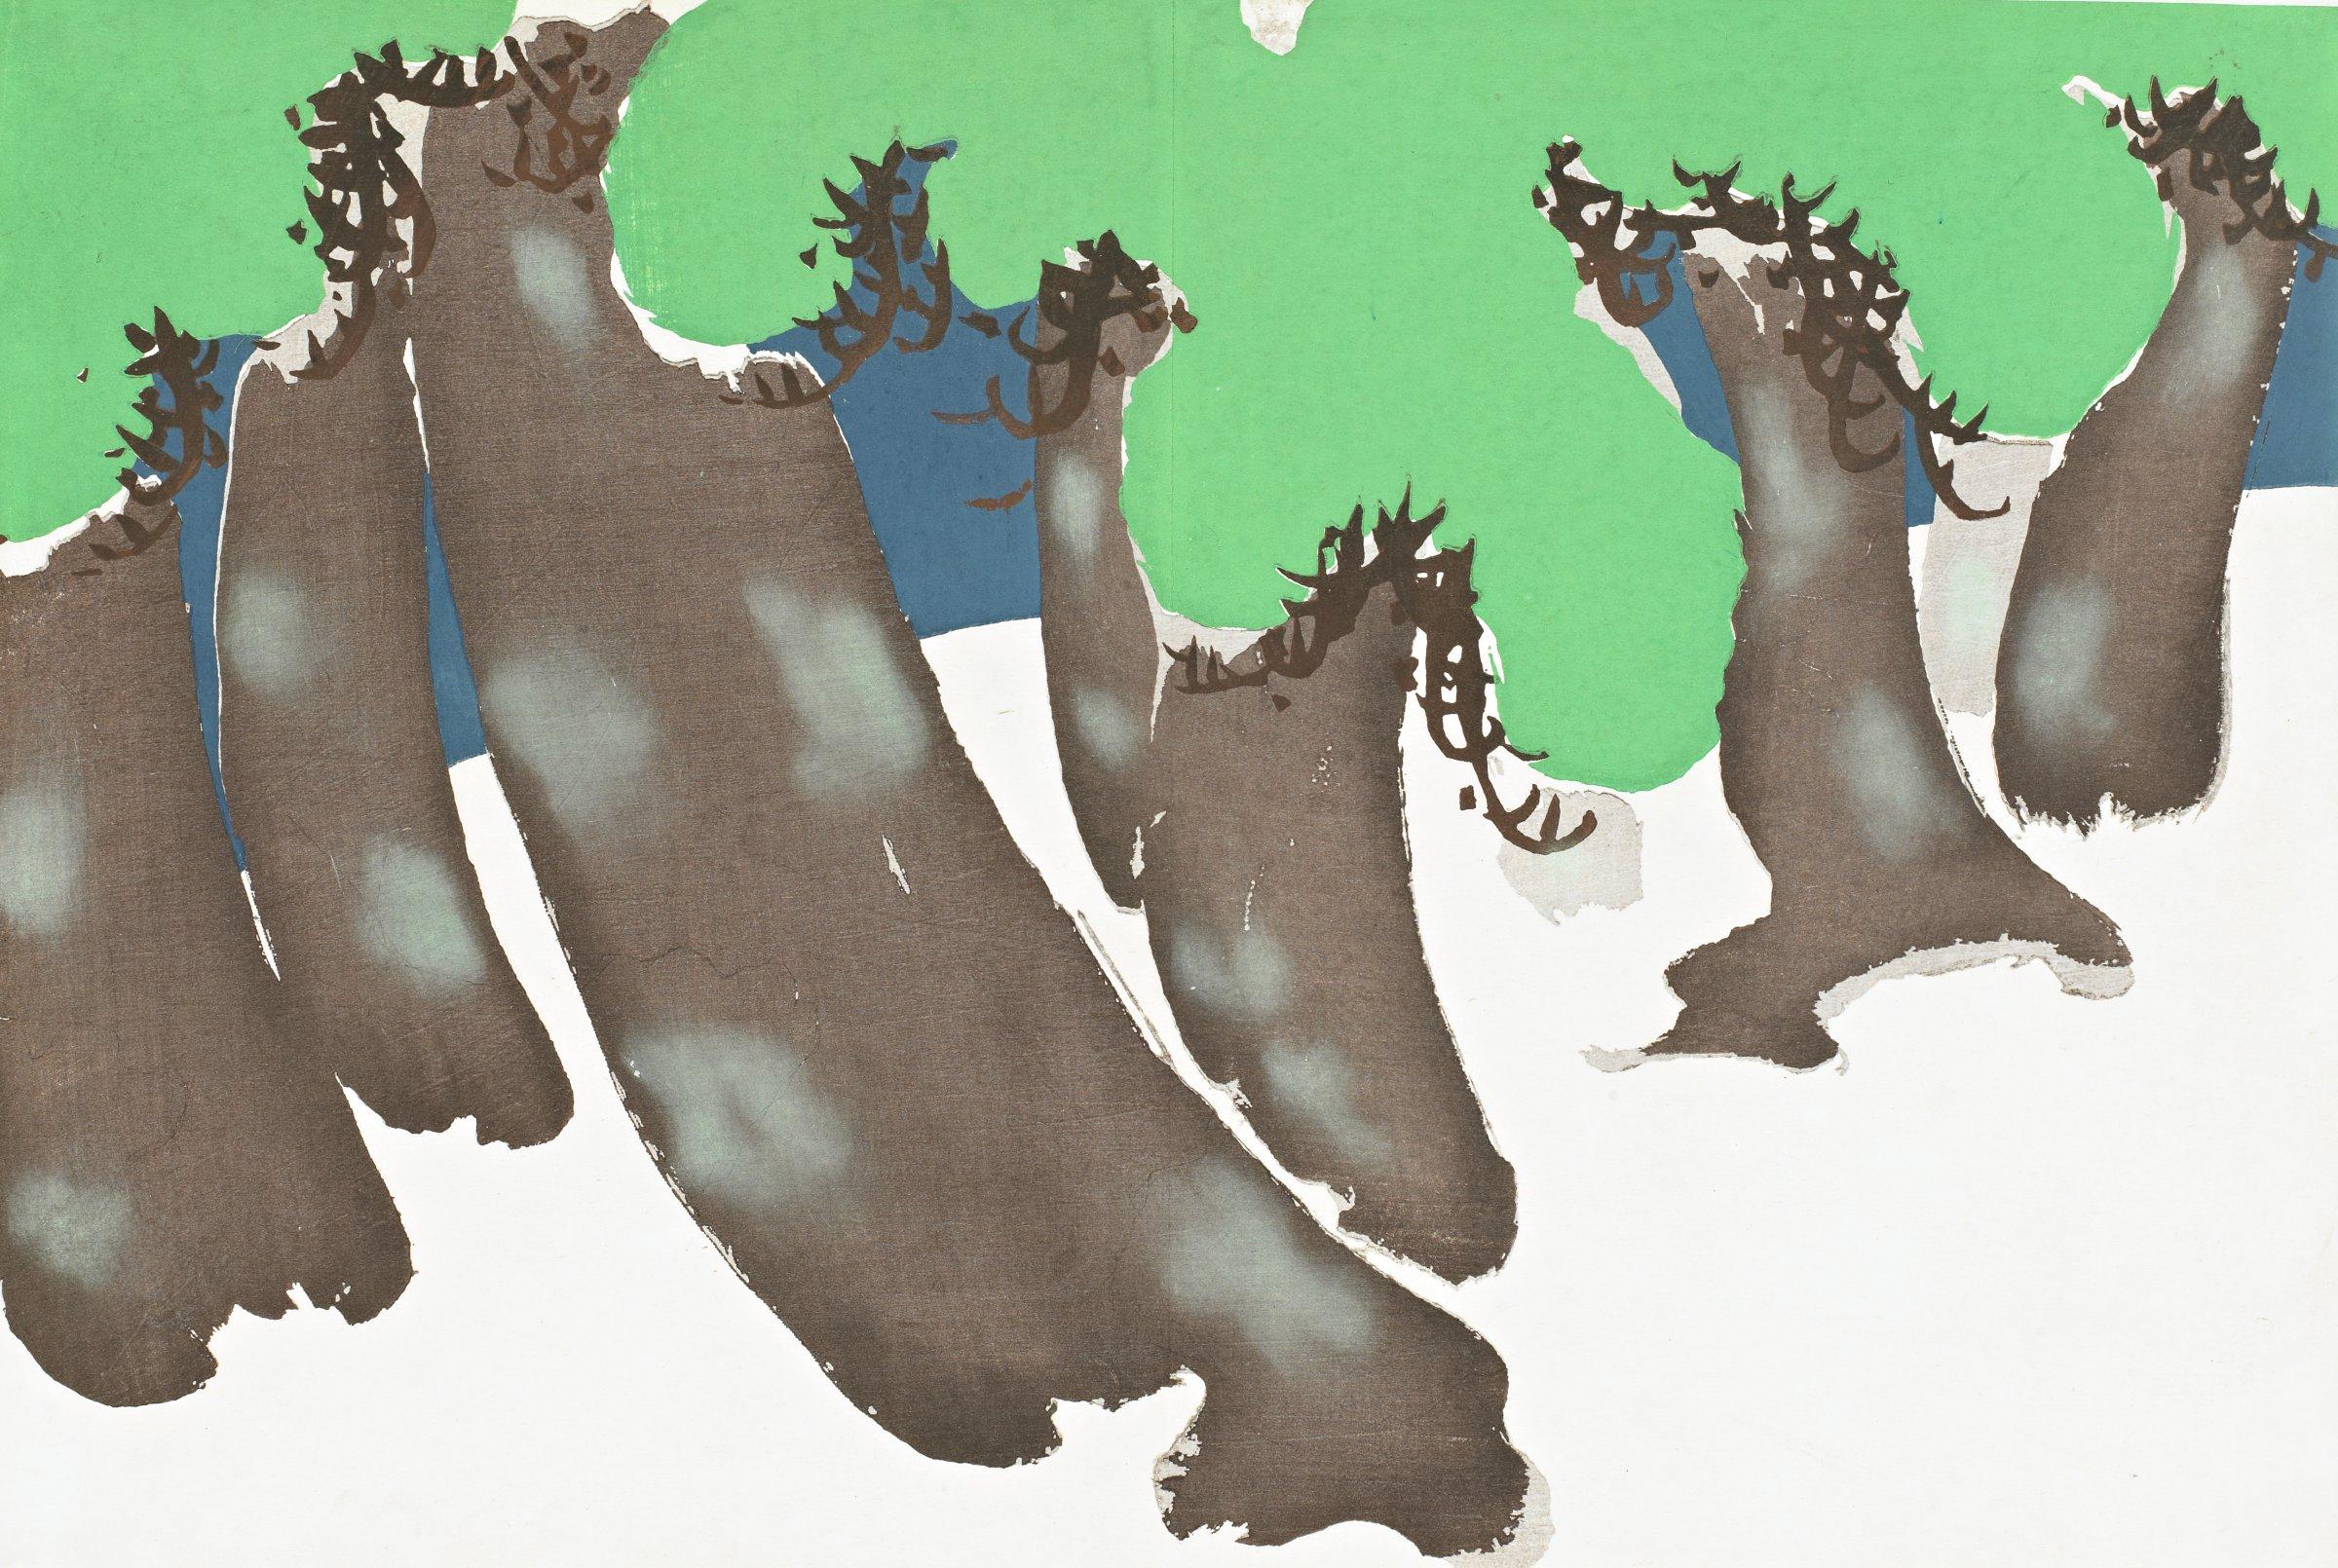 Sonarematsu (Windswept Coastal Pines), from Momoyogusa (A World of Things), Volume 3, Kamisaka Sekka, ink and color on paper